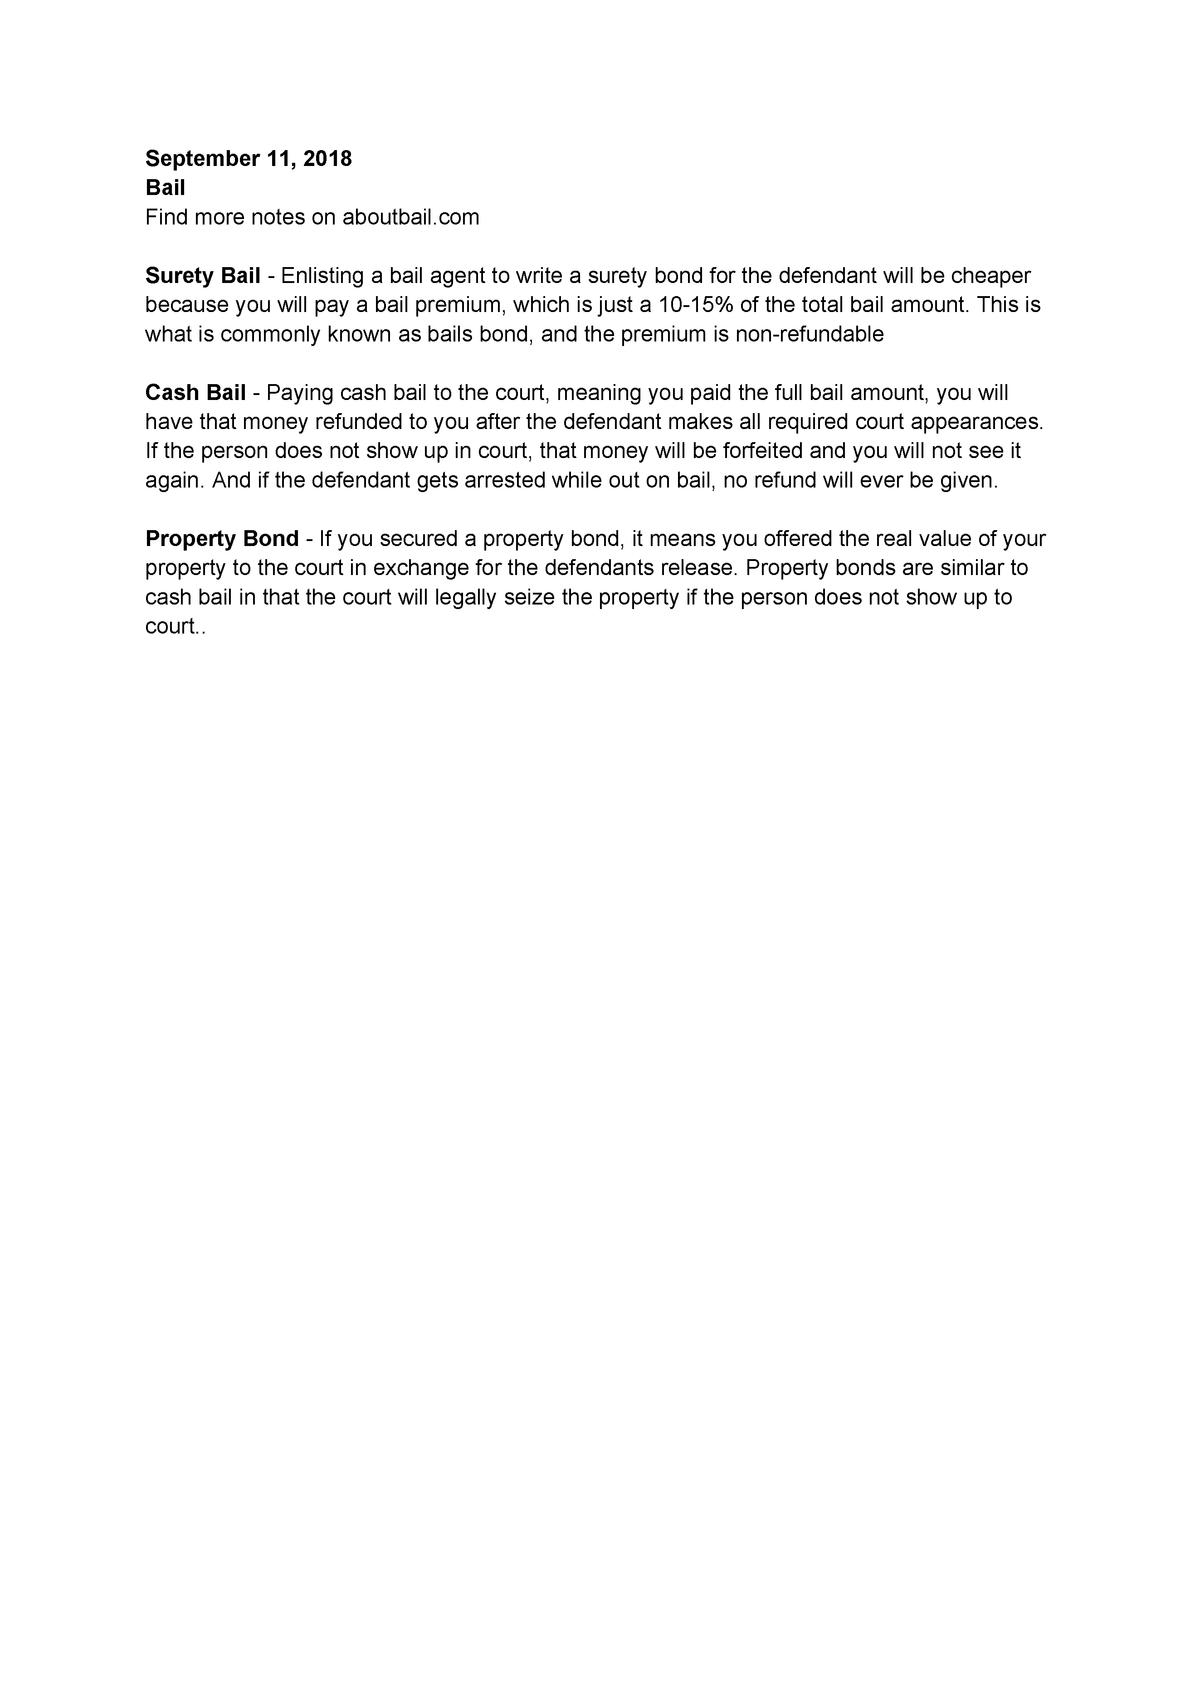 Psych 339 Notes On Bail Umass Boston Studocu